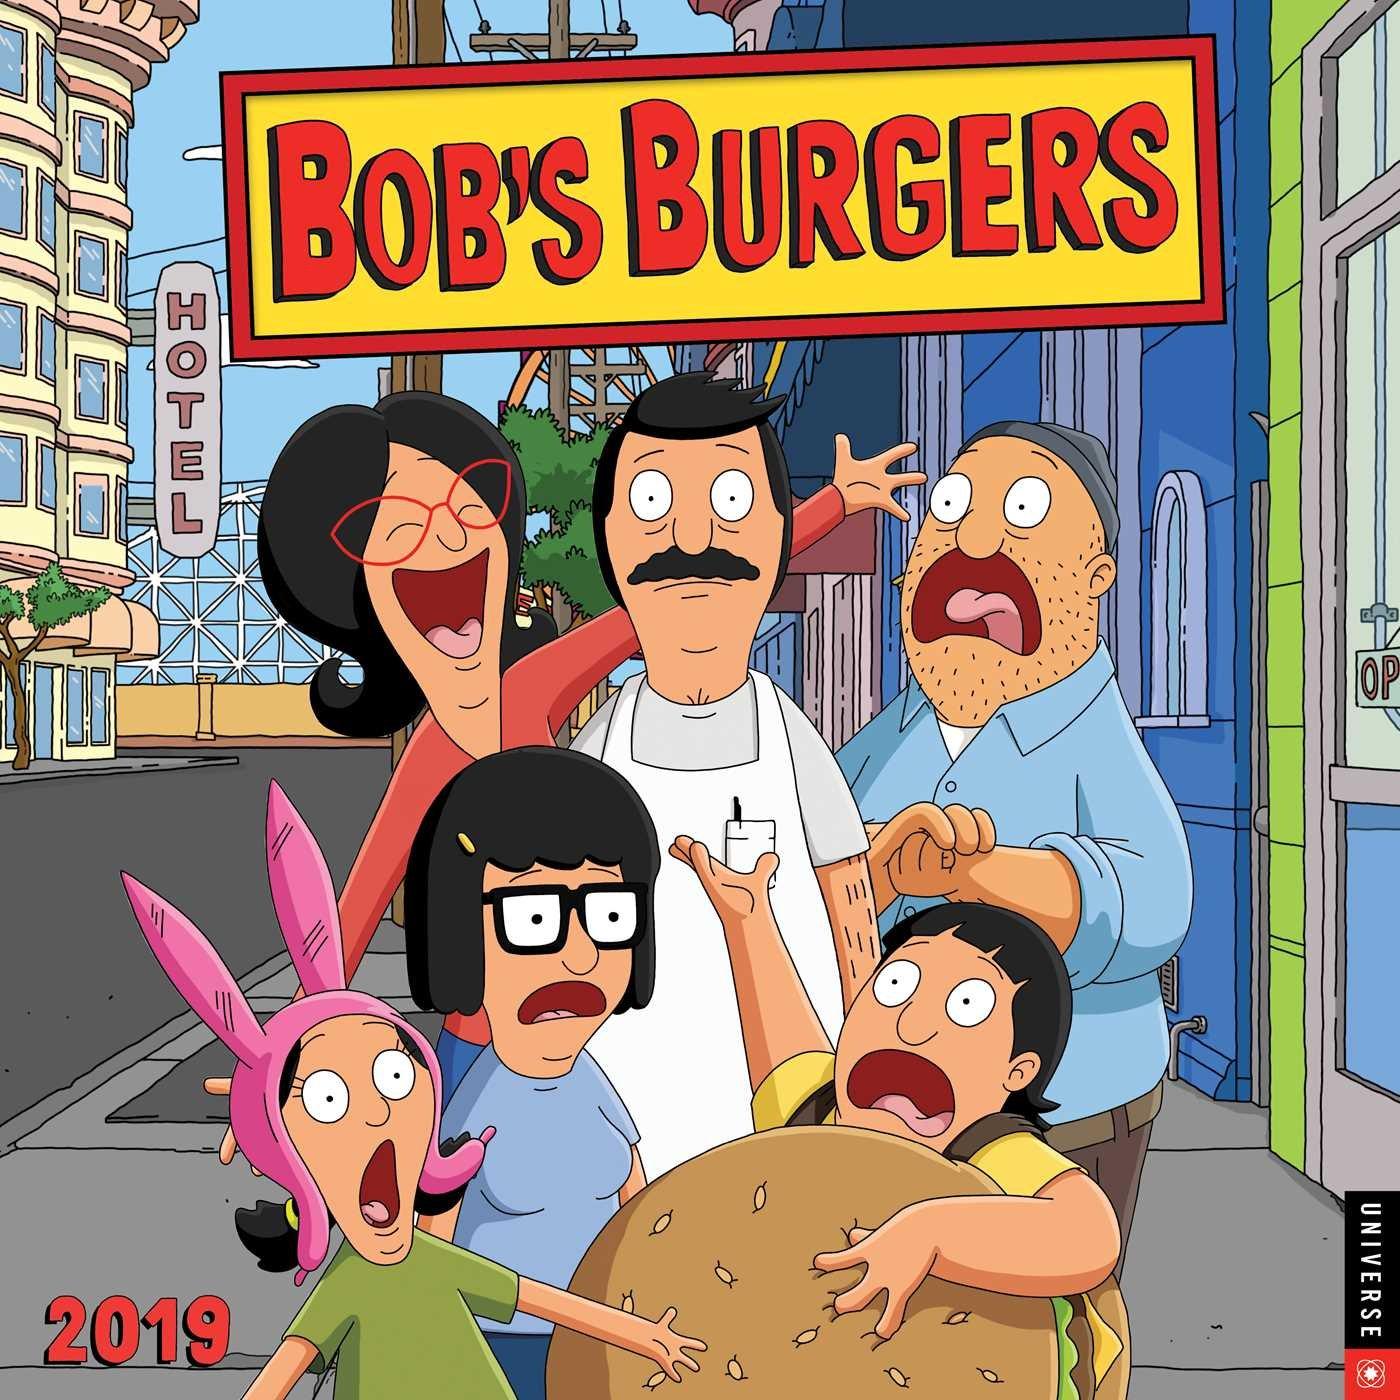 bobs burgers 2019 wall calendar